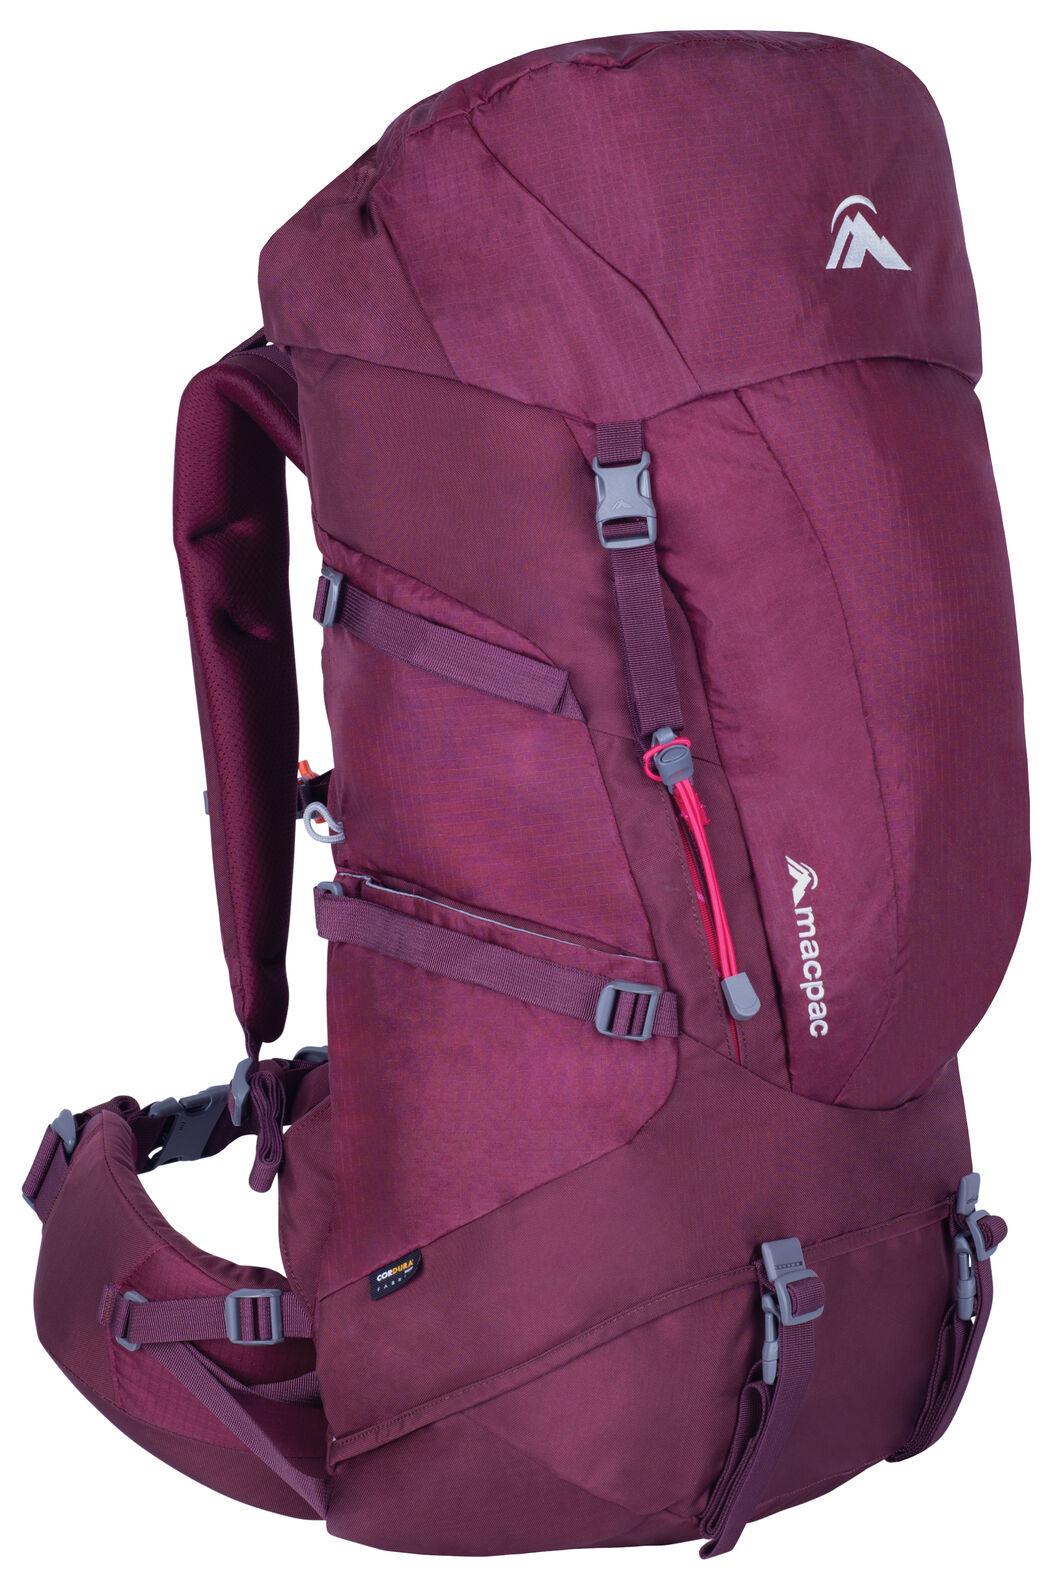 Macpac Torlesse 50L Pack V2, Rhodo/Windsor, hi-res